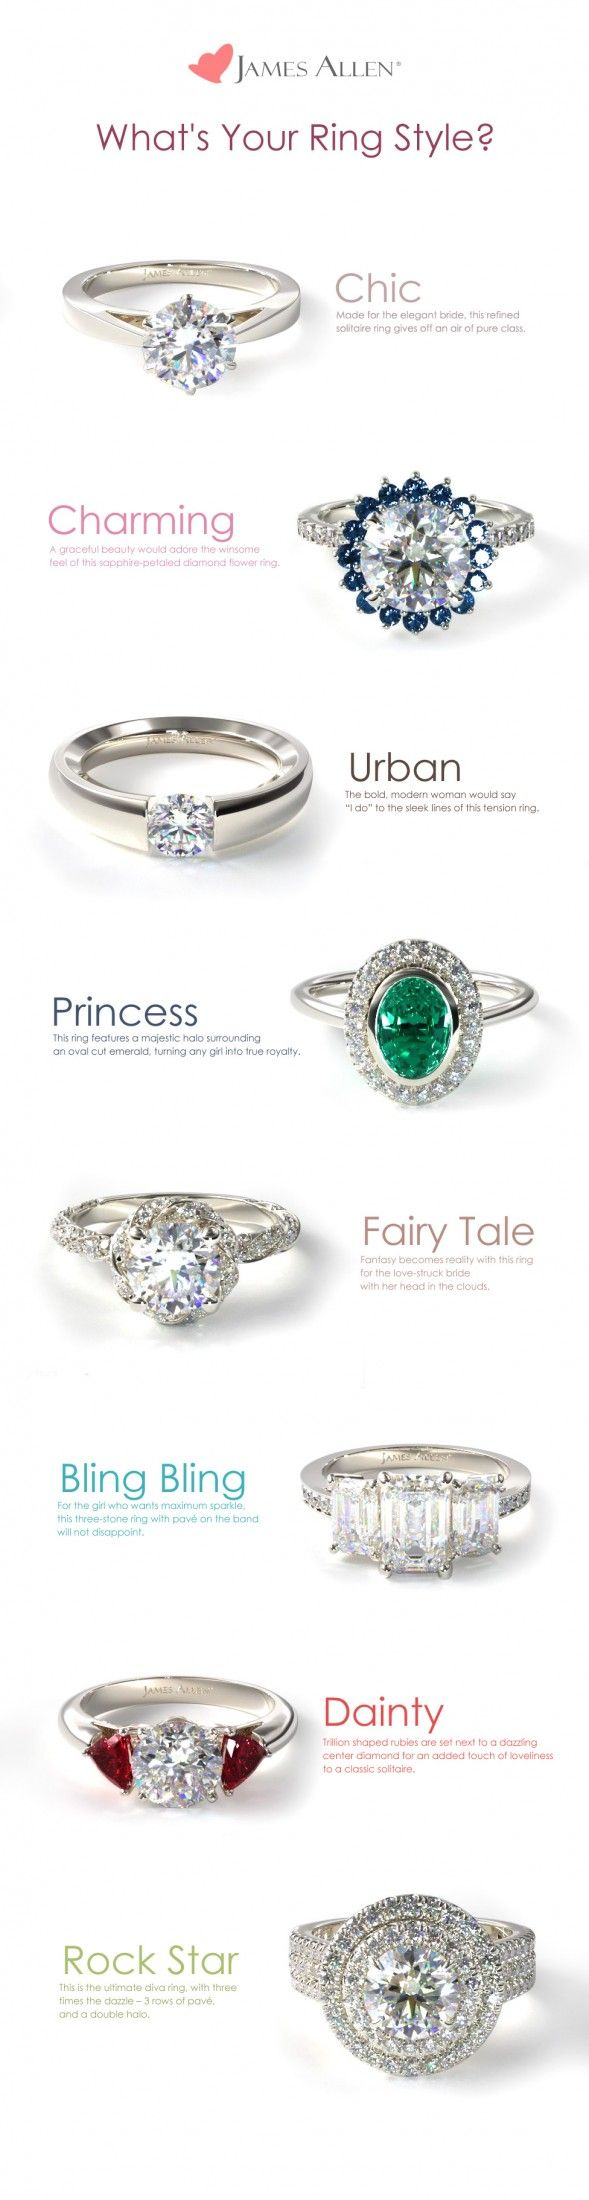 Wonderful Weddings: Engagement Rings - All Settings